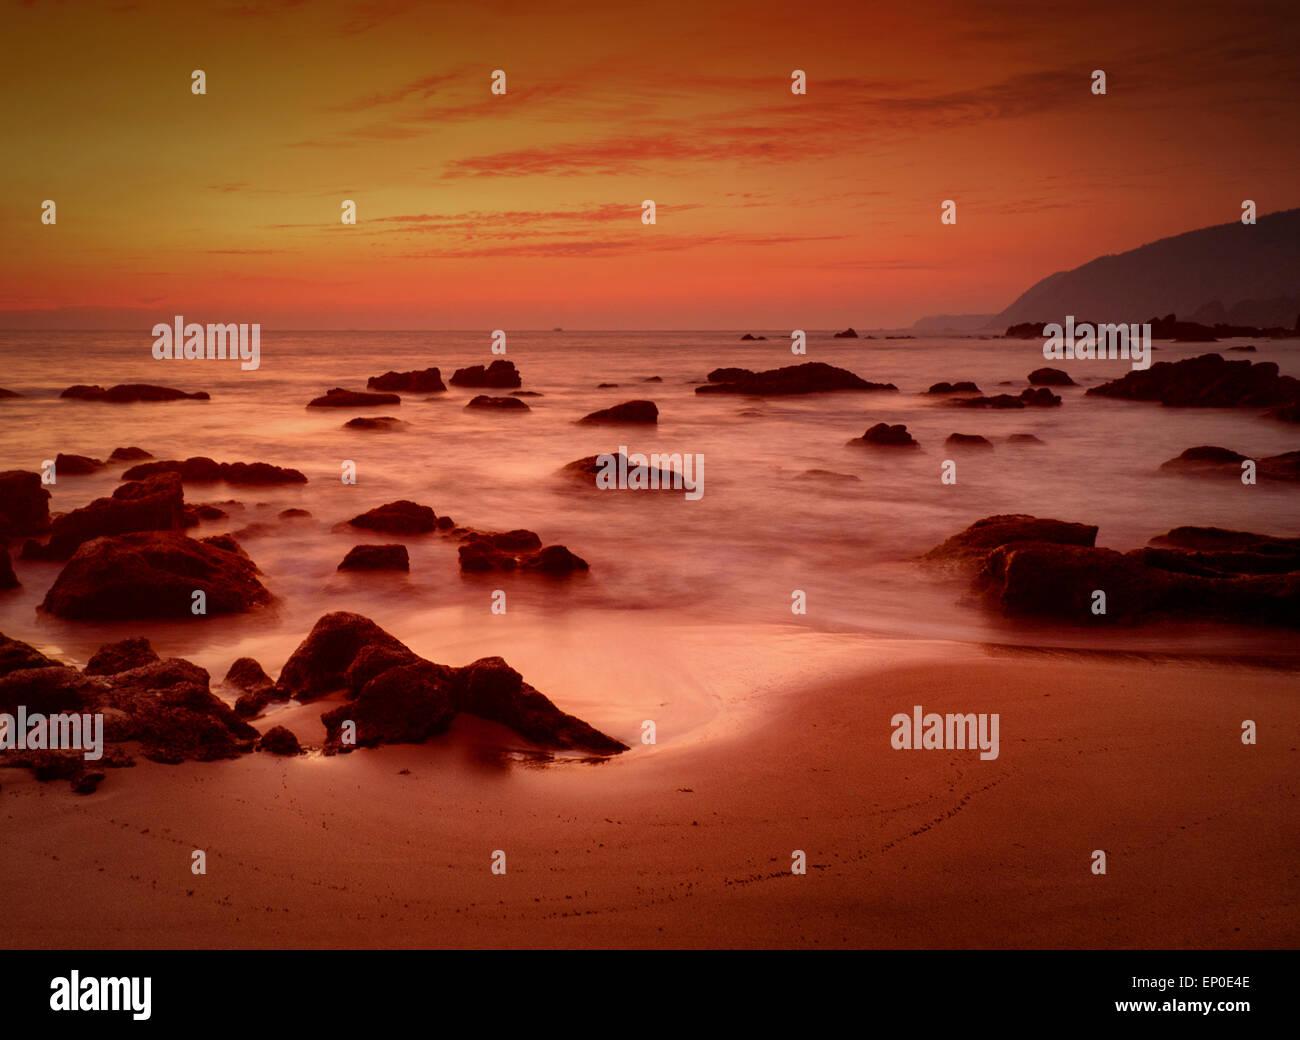 Sonnenuntergang Nachleuchten bei Cola Beach, Canacona, Goa, Indien Stockbild